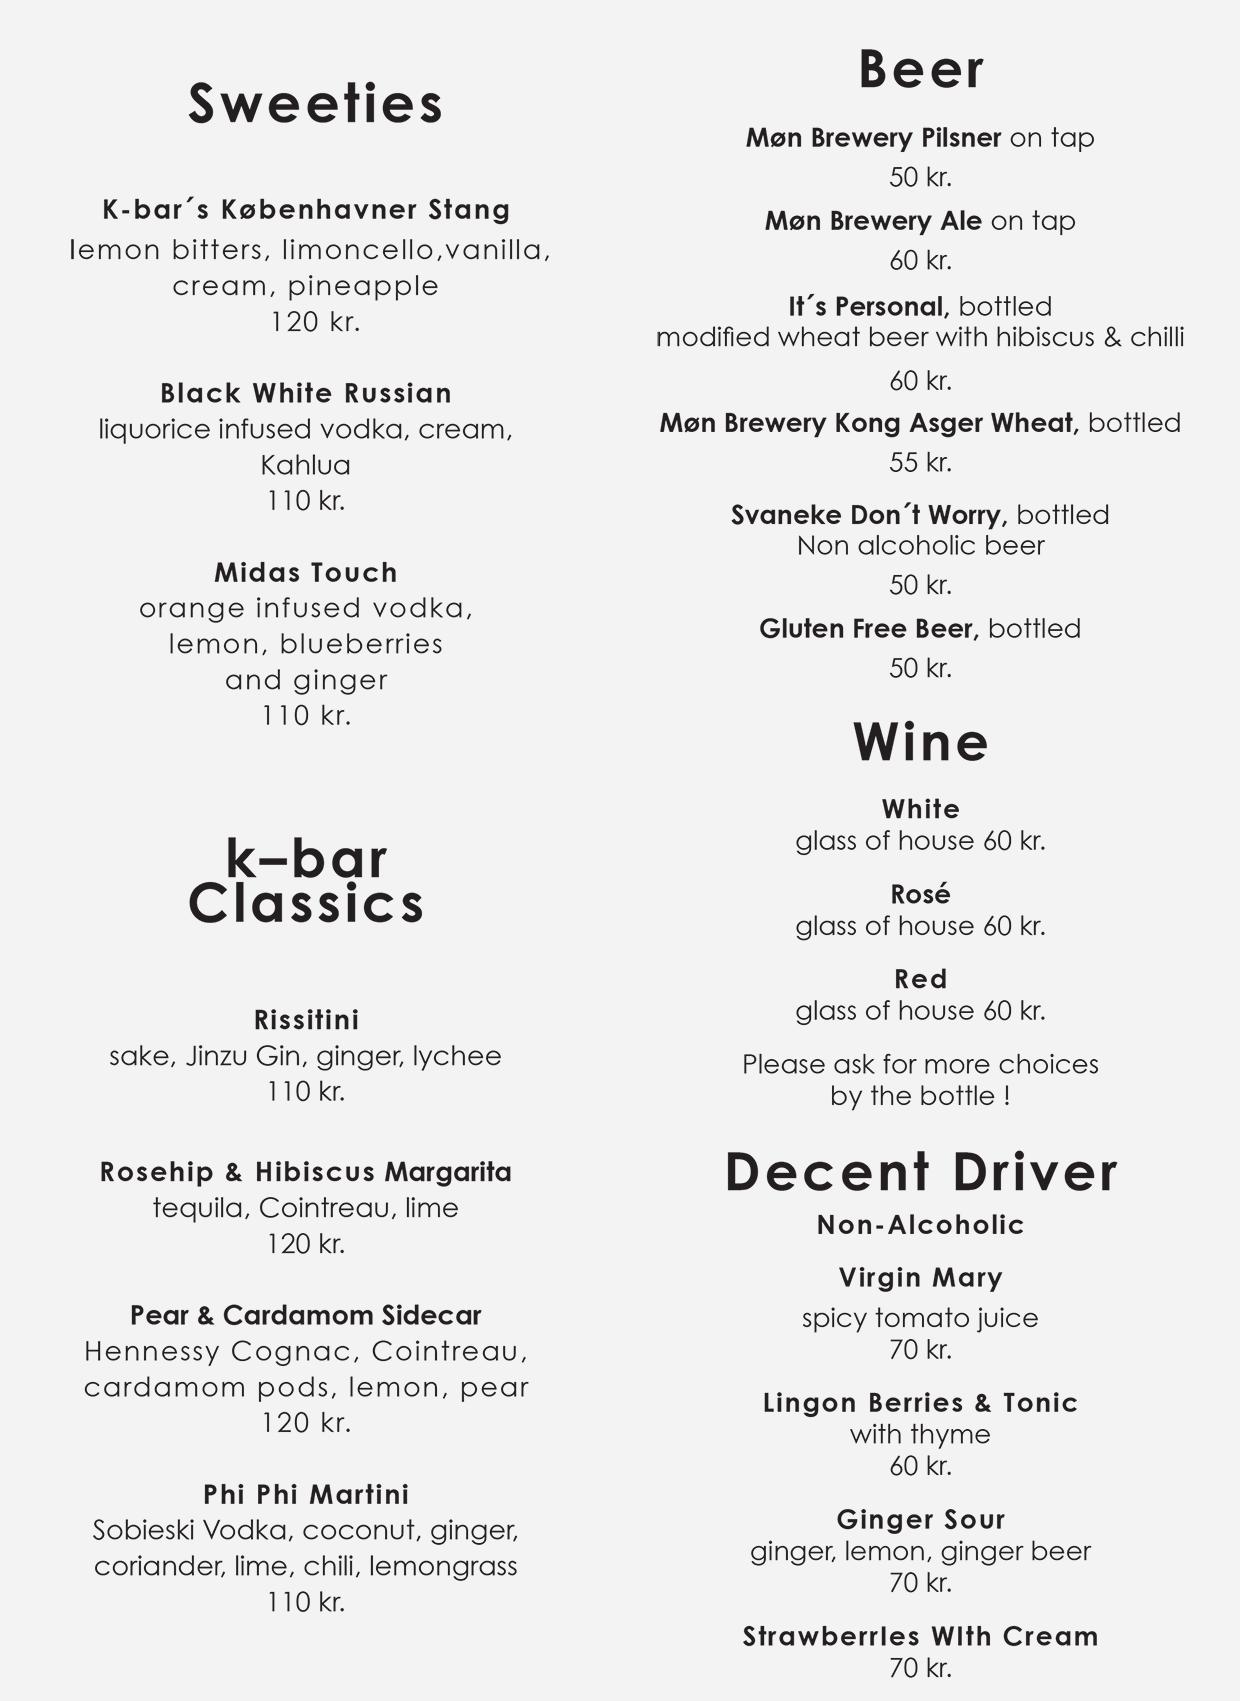 Kbar kocktailkort 20180820 4